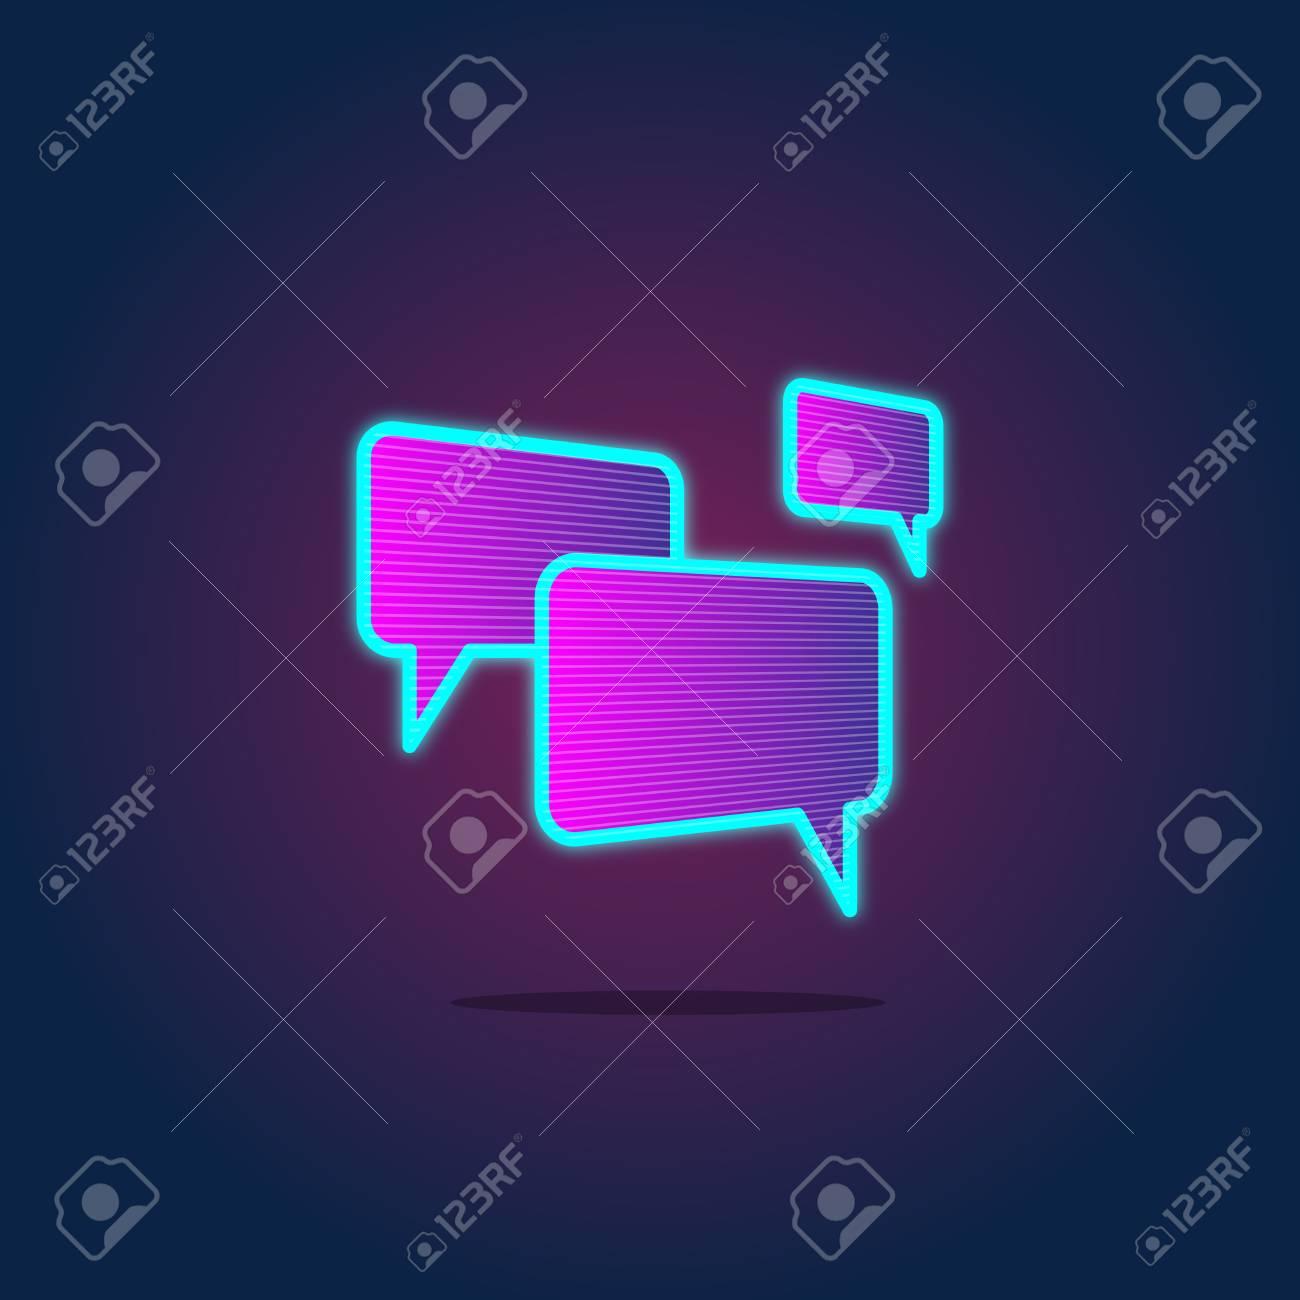 Speech Bubble Chatting Icon Concept - 71679531